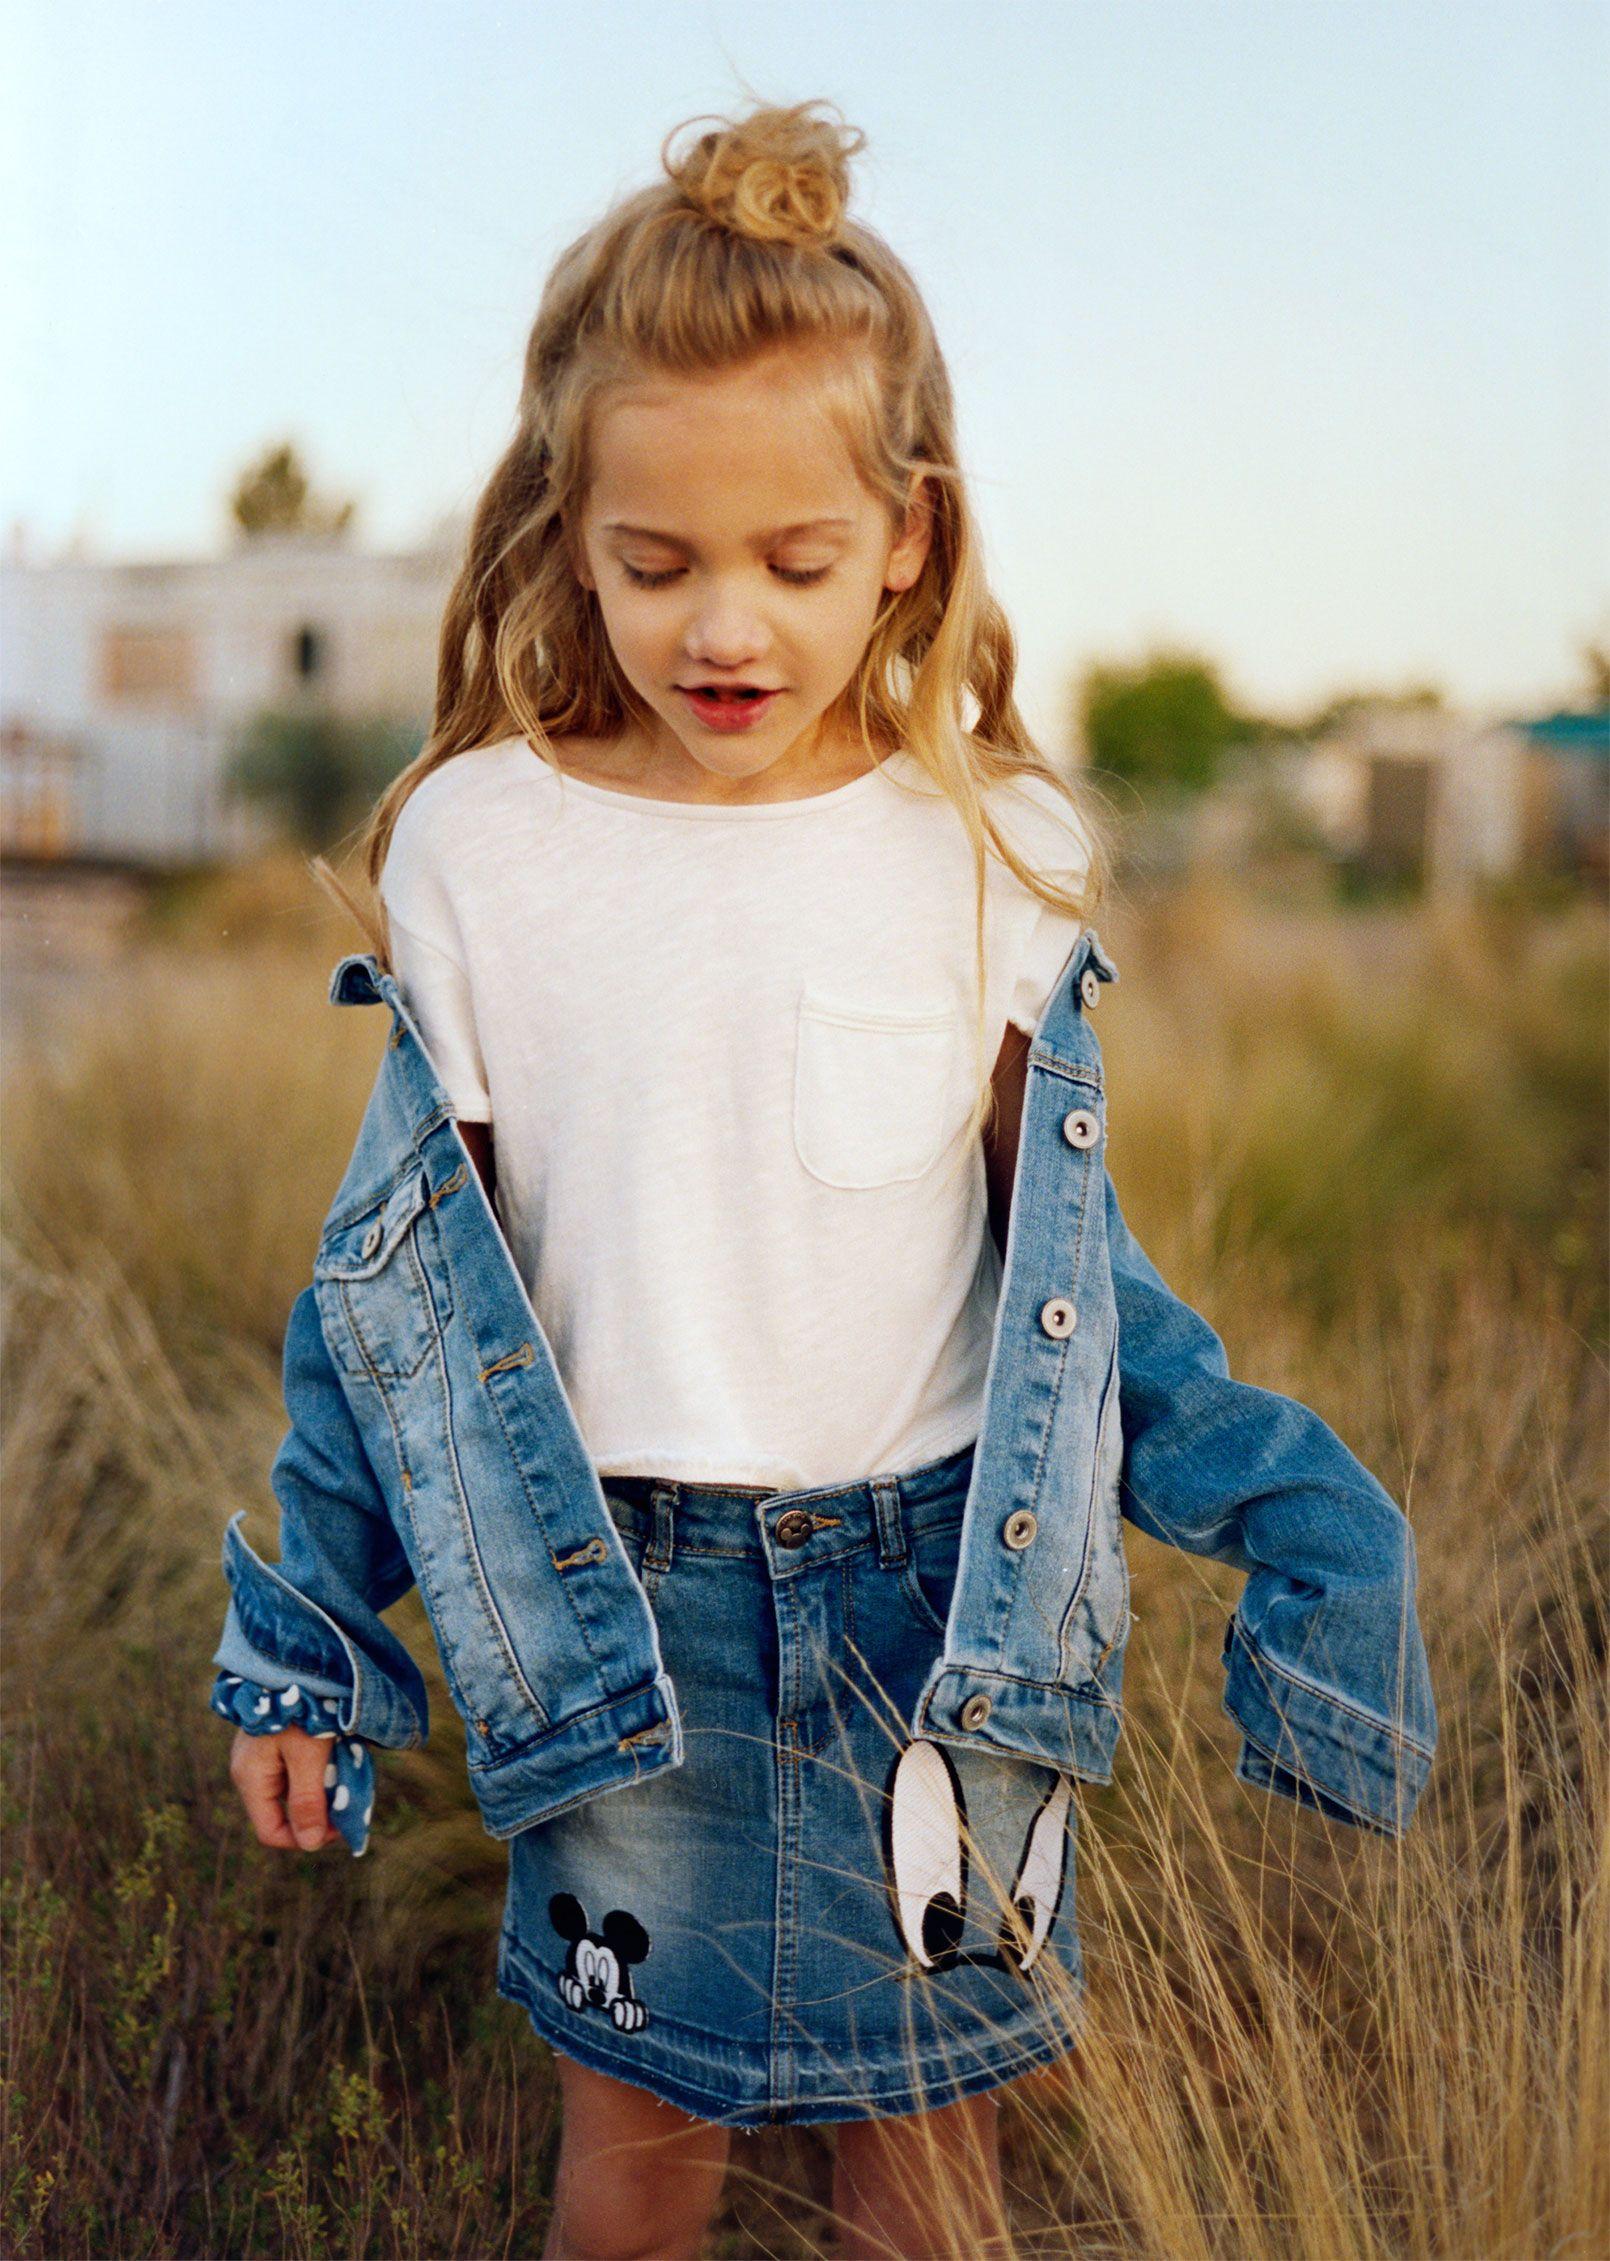 ZARA - #zaraeditorial# - KIDS - SUMMER CAMP | GIRL | Mode ...